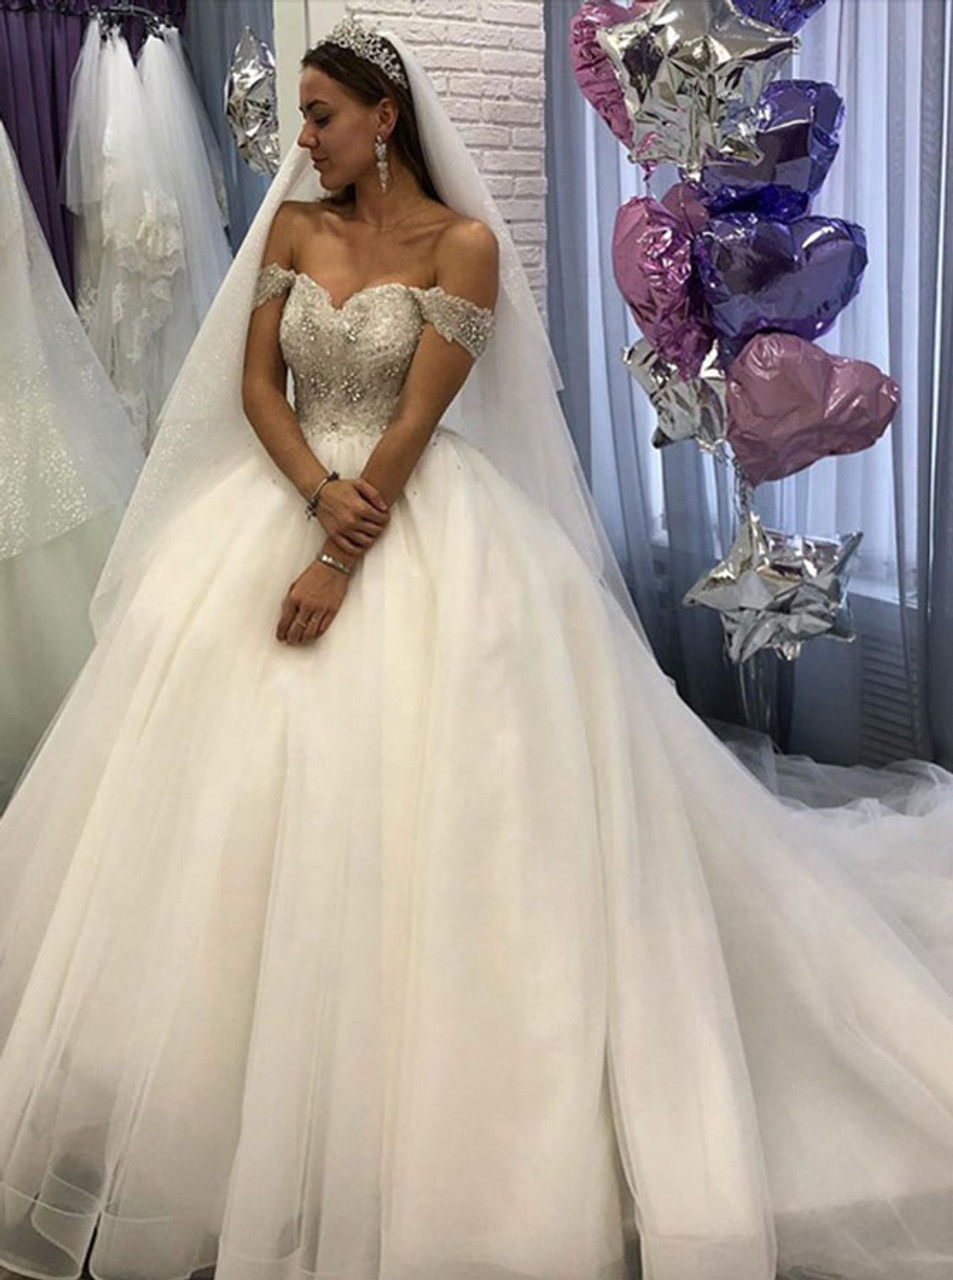 Ivory Wedding Dresses,Off the Shoulder Bridal Dress,Princess Wedding  Dress,20